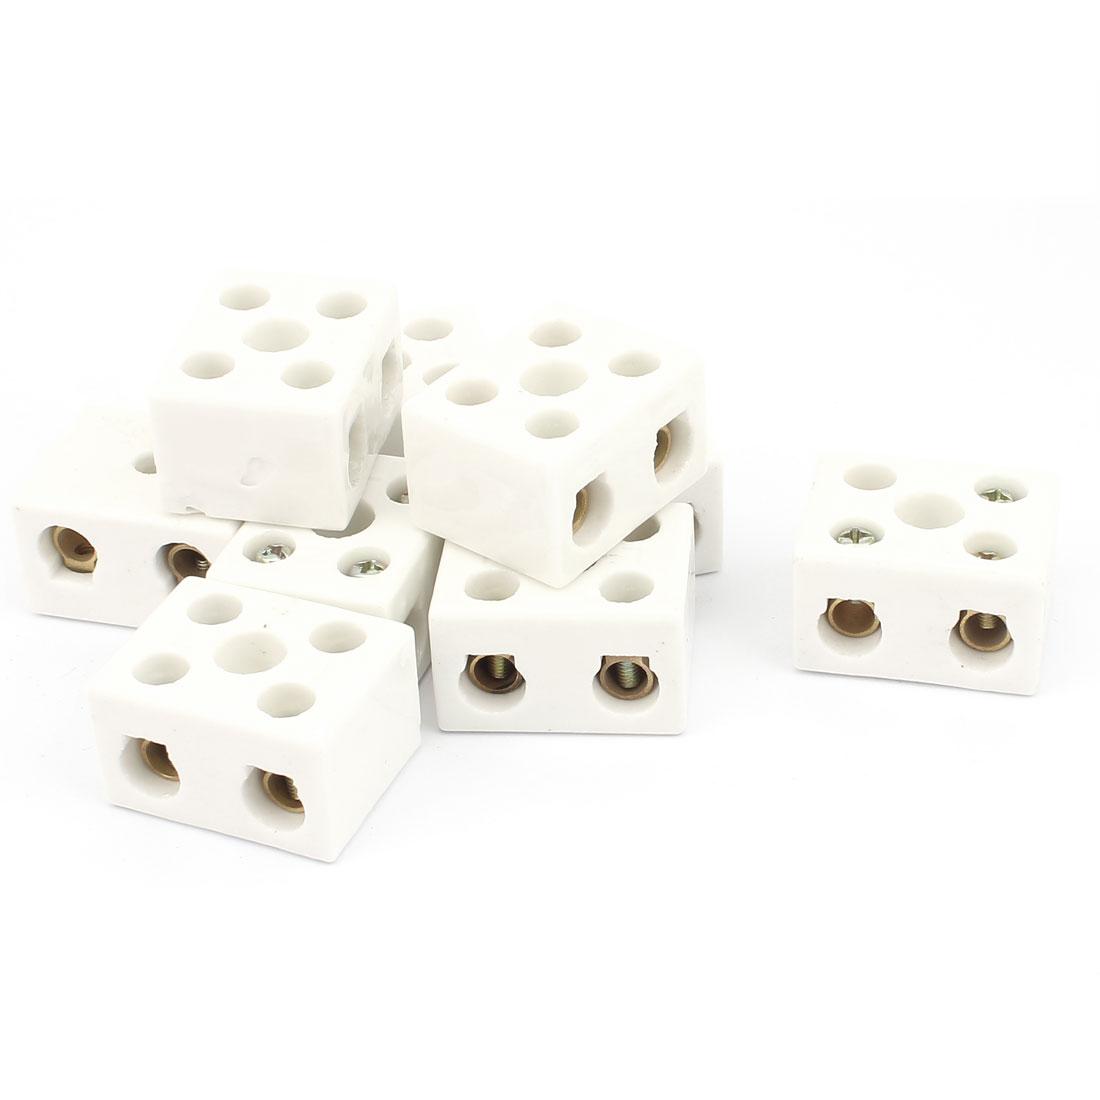 9pcs 2 Way 5 Hole 2W5H Porcelain Ceramic Terminal Block Wire Connector 25A